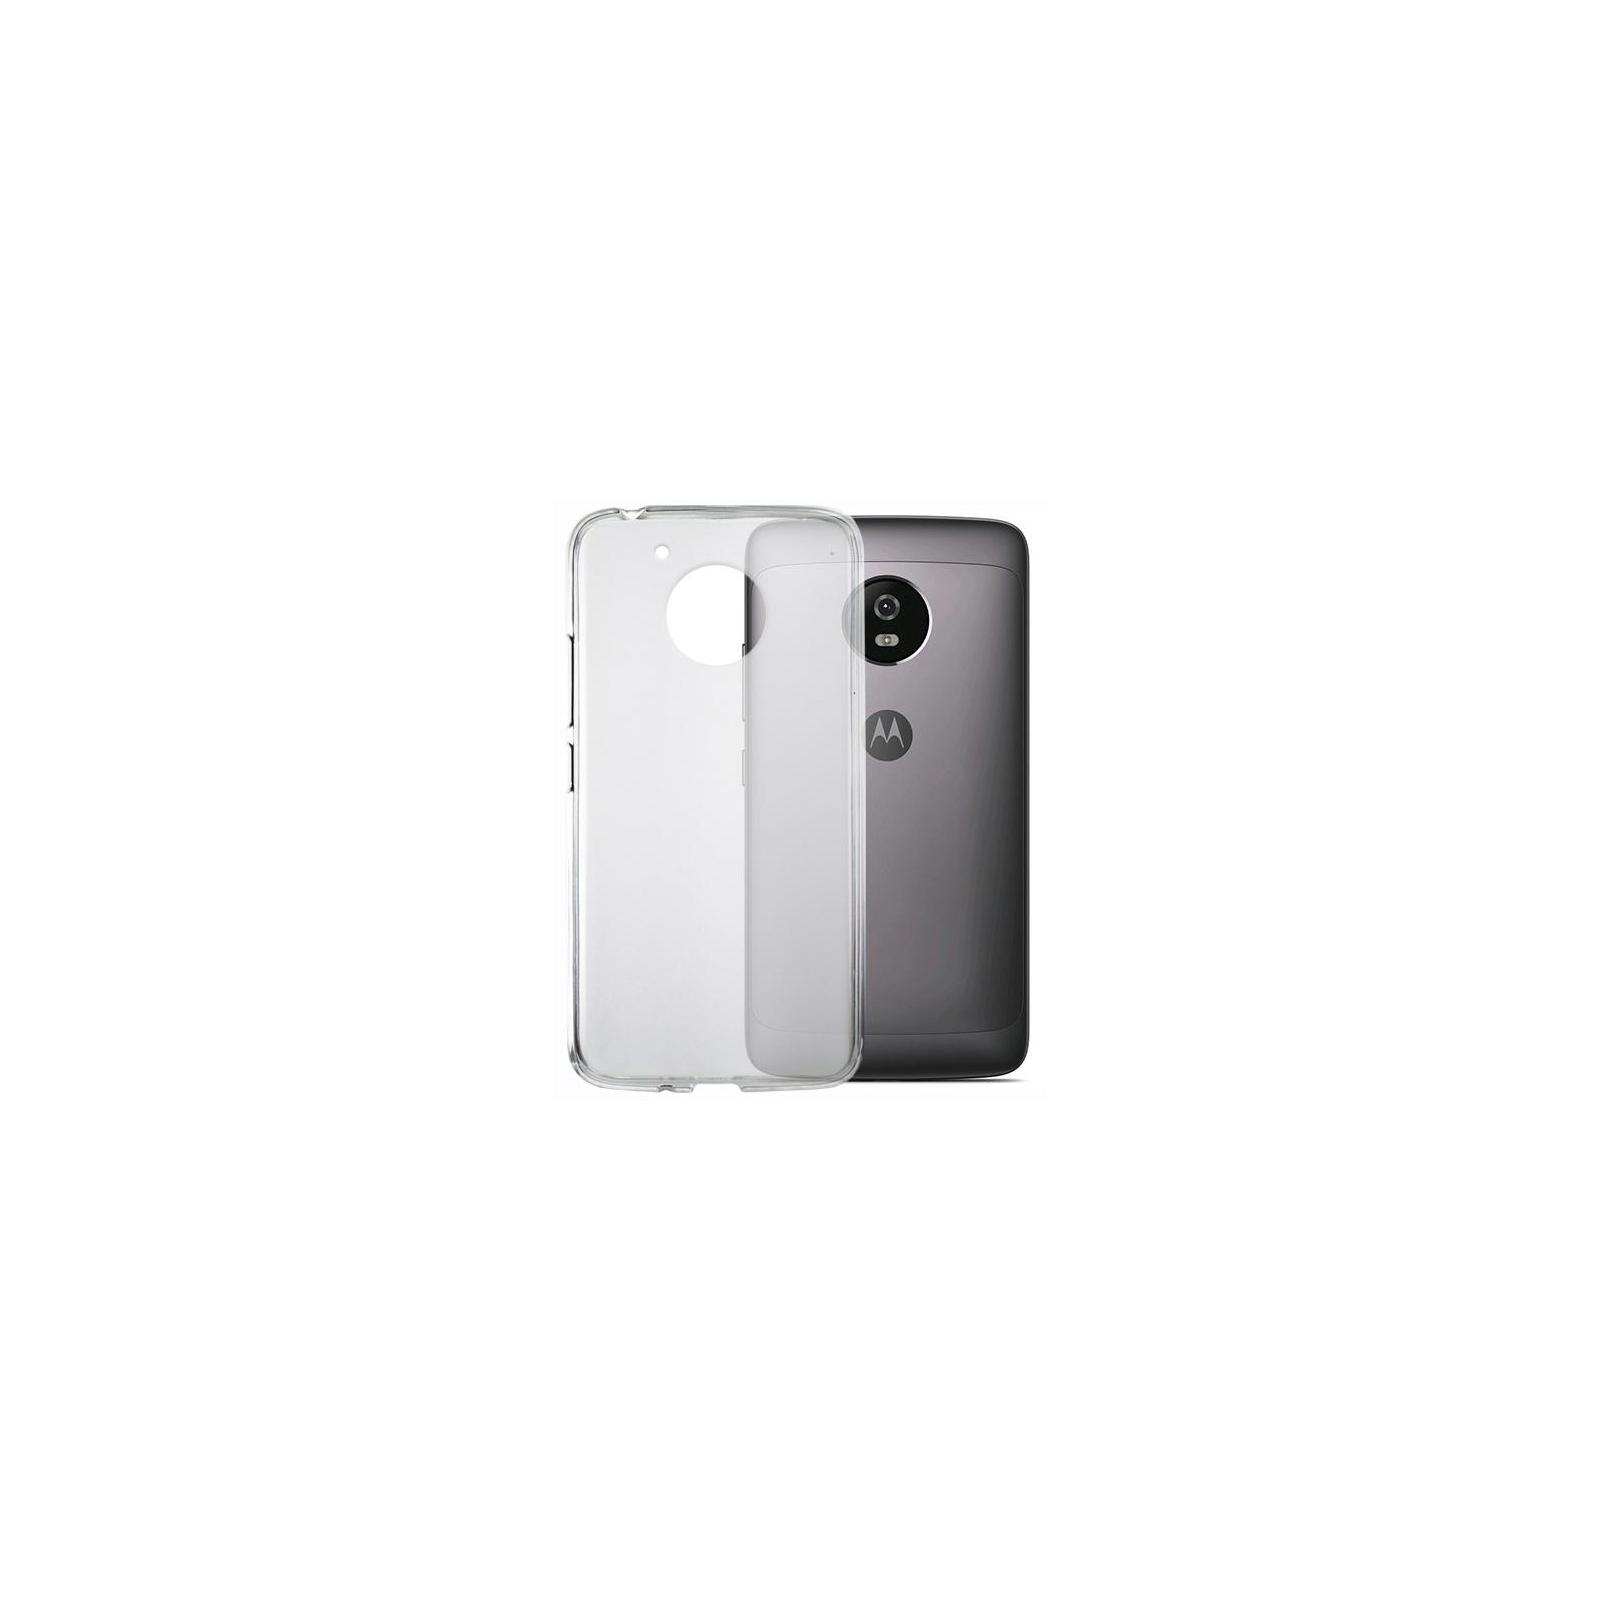 Чехол для моб. телефона Colorway TPU case for Motorola MOTO G5 Plus (XT1685) (CW-CTBMMG5P) изображение 3